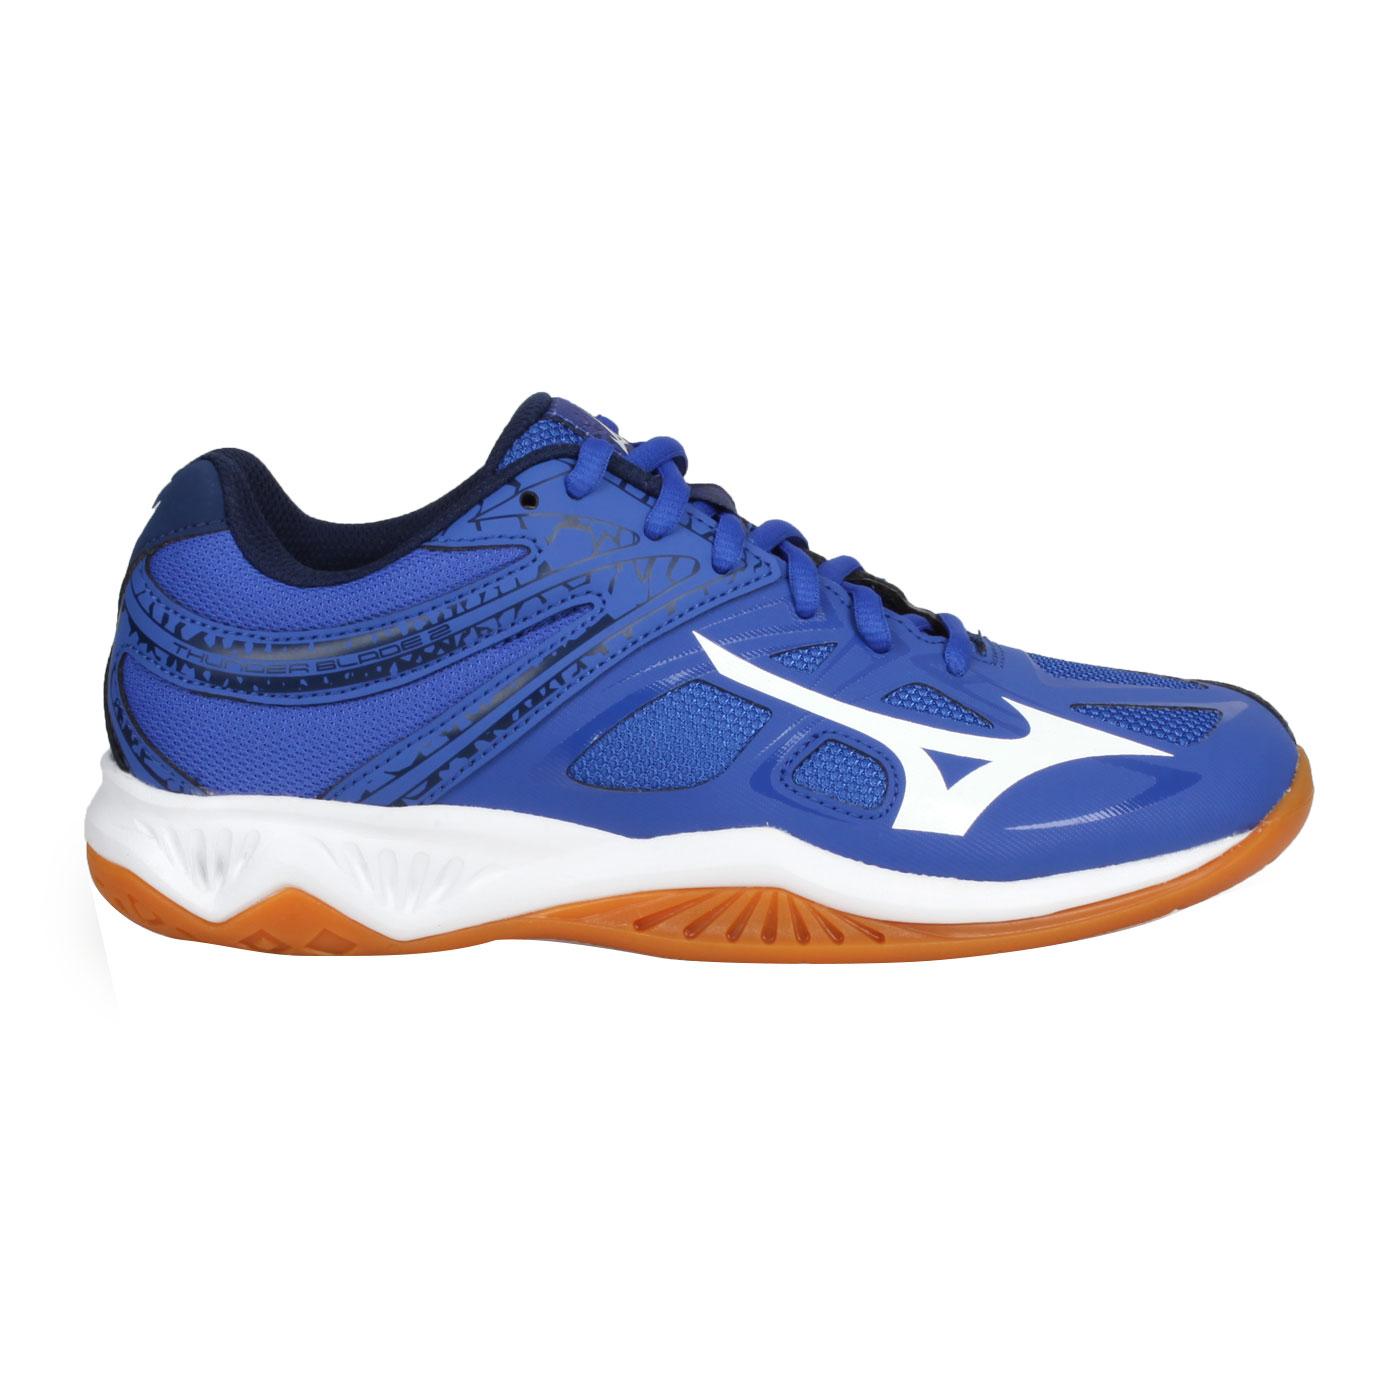 MIZUNO 排球鞋  @THUNDER BLADE 2@V1GA197013 - 藍白丈青